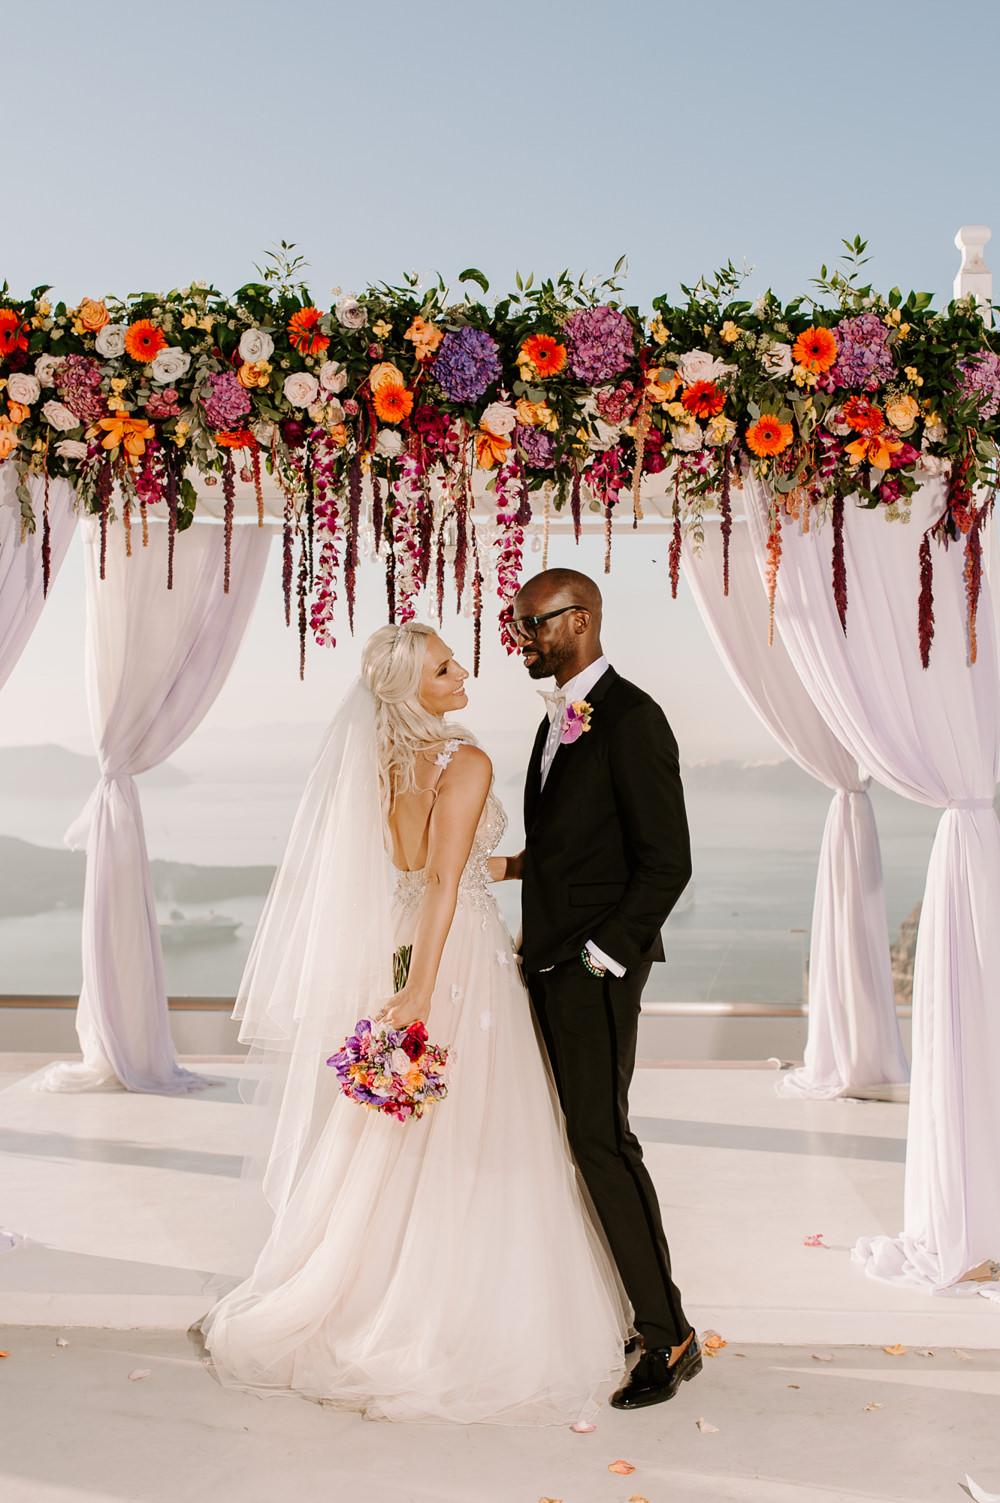 Santorini Wedding Phosart Photography Ceremony Backdrop Aisle Flower Arch Pampas Grass Rose Colourful